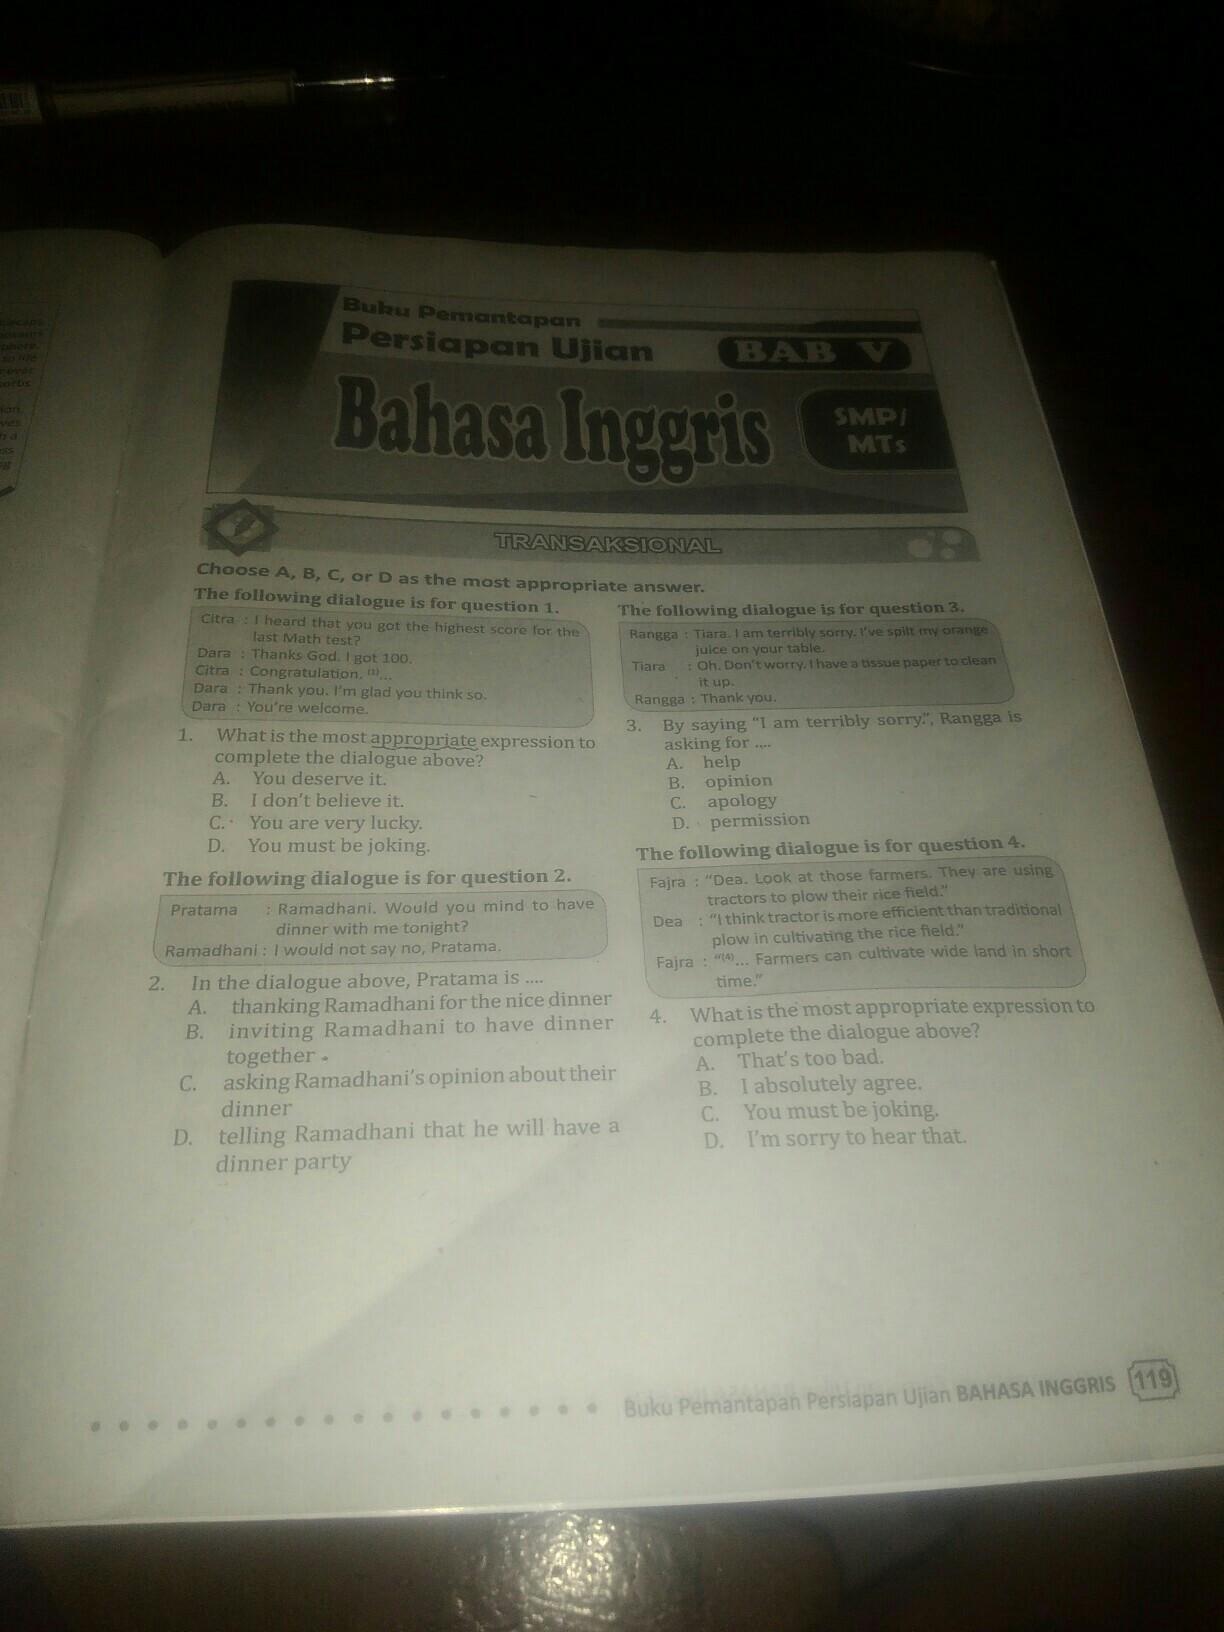 Tolong Beri Tahu Saya Kunci Jawaban Soal Pada Buku Pemantapan Persiapan Ujian Bahasa Inggris Brainly Co Id